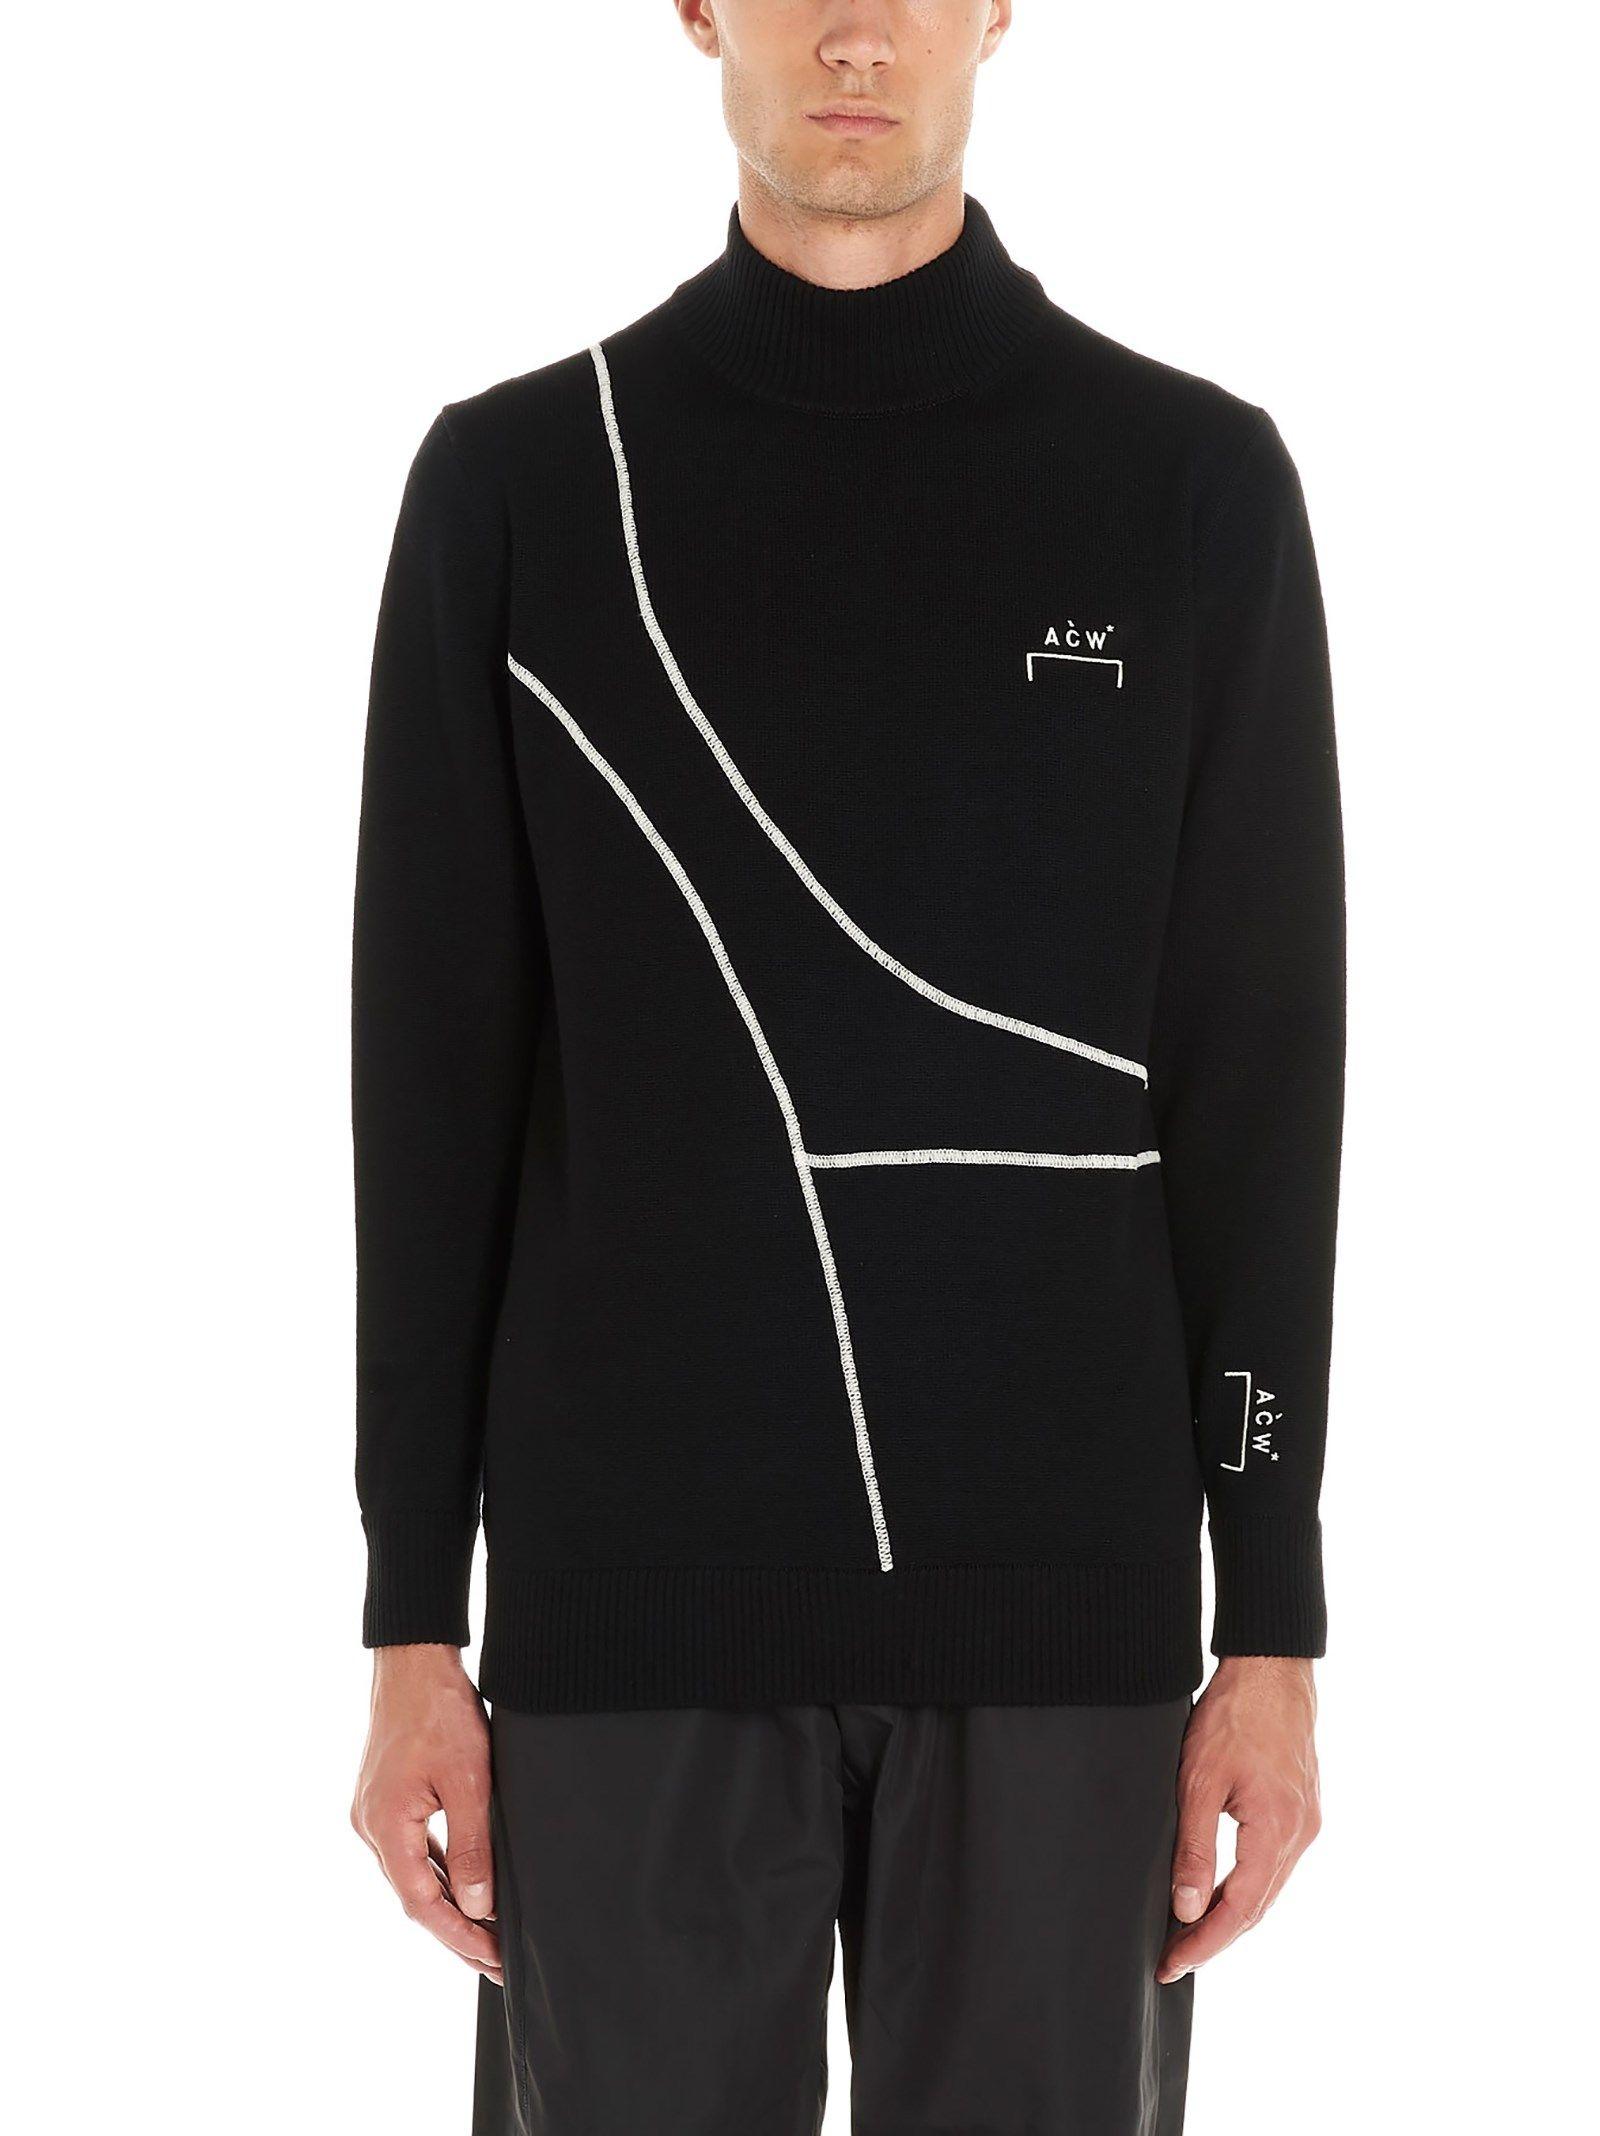 A-COLD-WALL* MEN'S ACWAW19KC01BLACK BLACK WOOL Sweaters